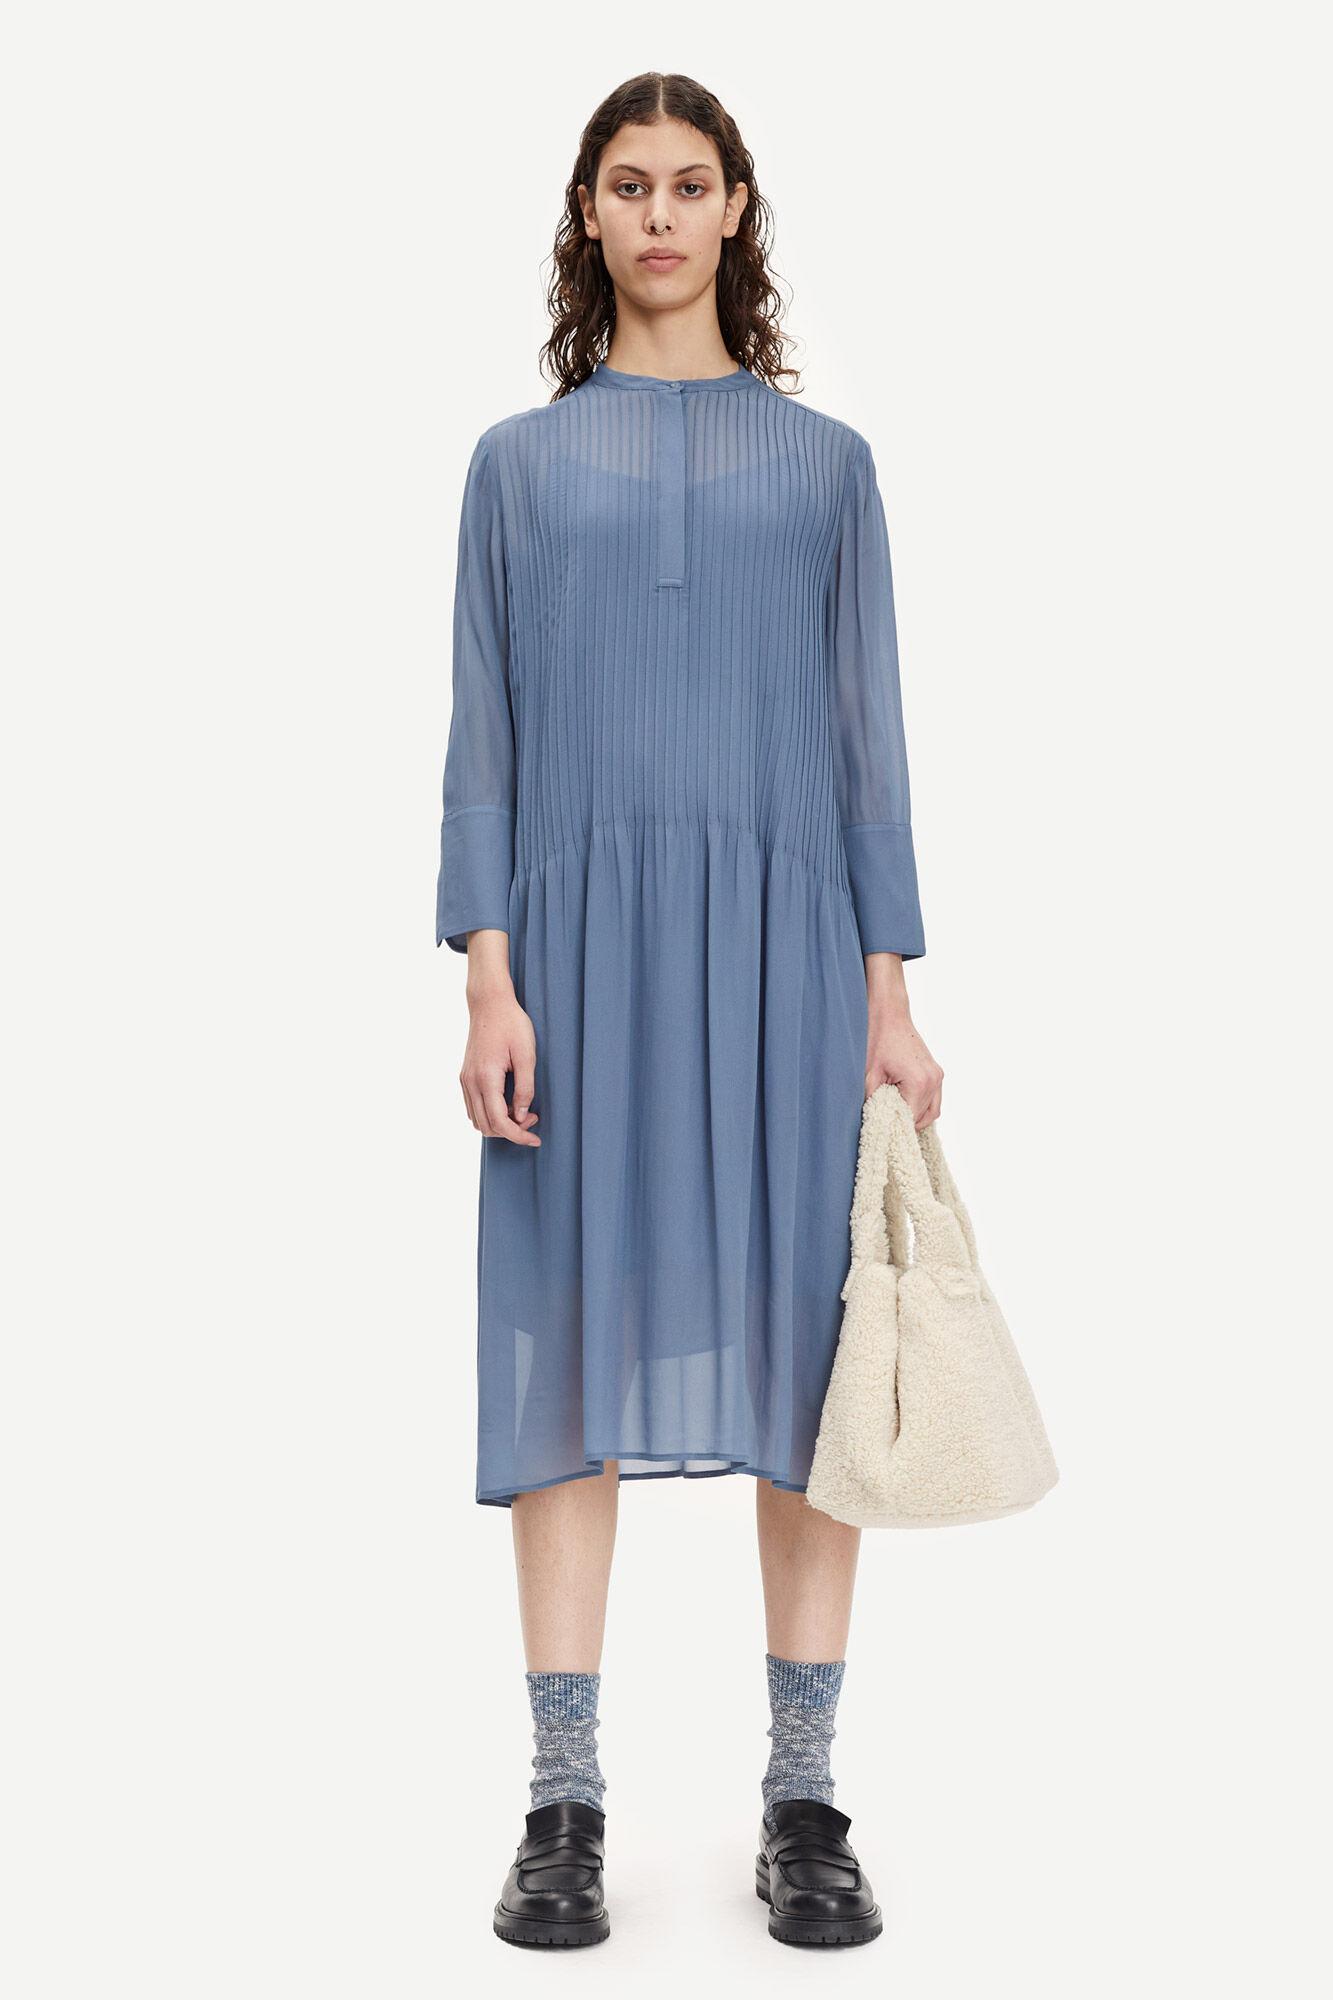 Samsøe Samsøe Elm Skjortekjole, China Blue, L